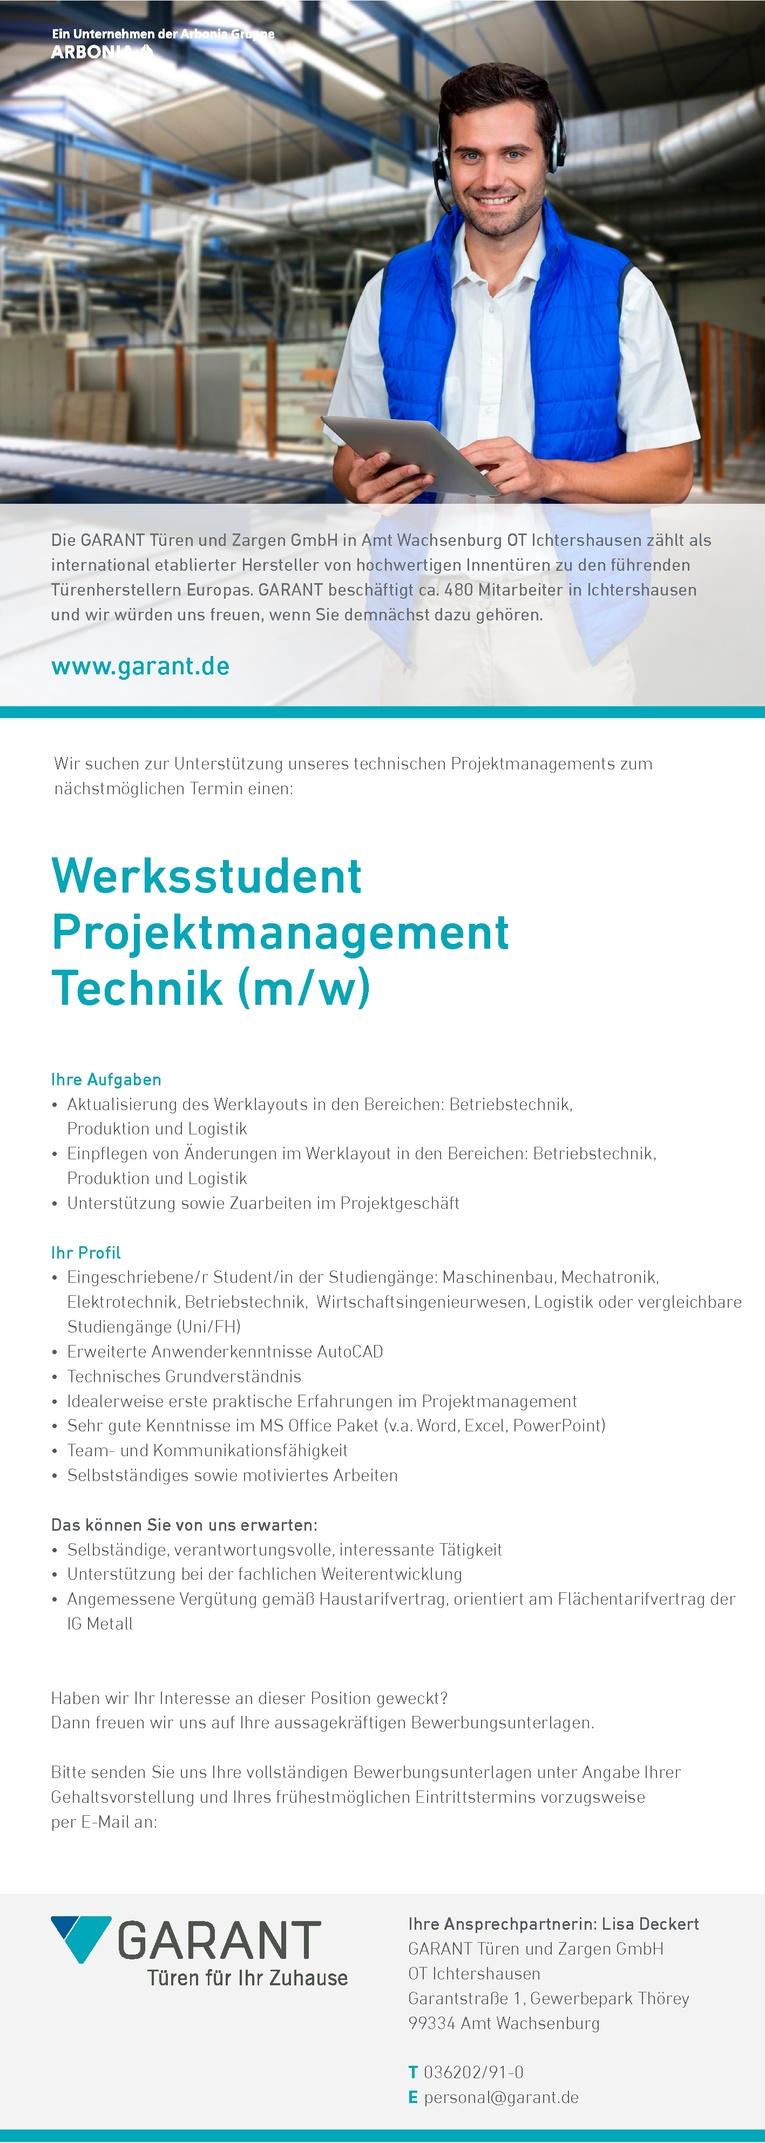 Werkstudent Projektmanagement Technik (m/w)